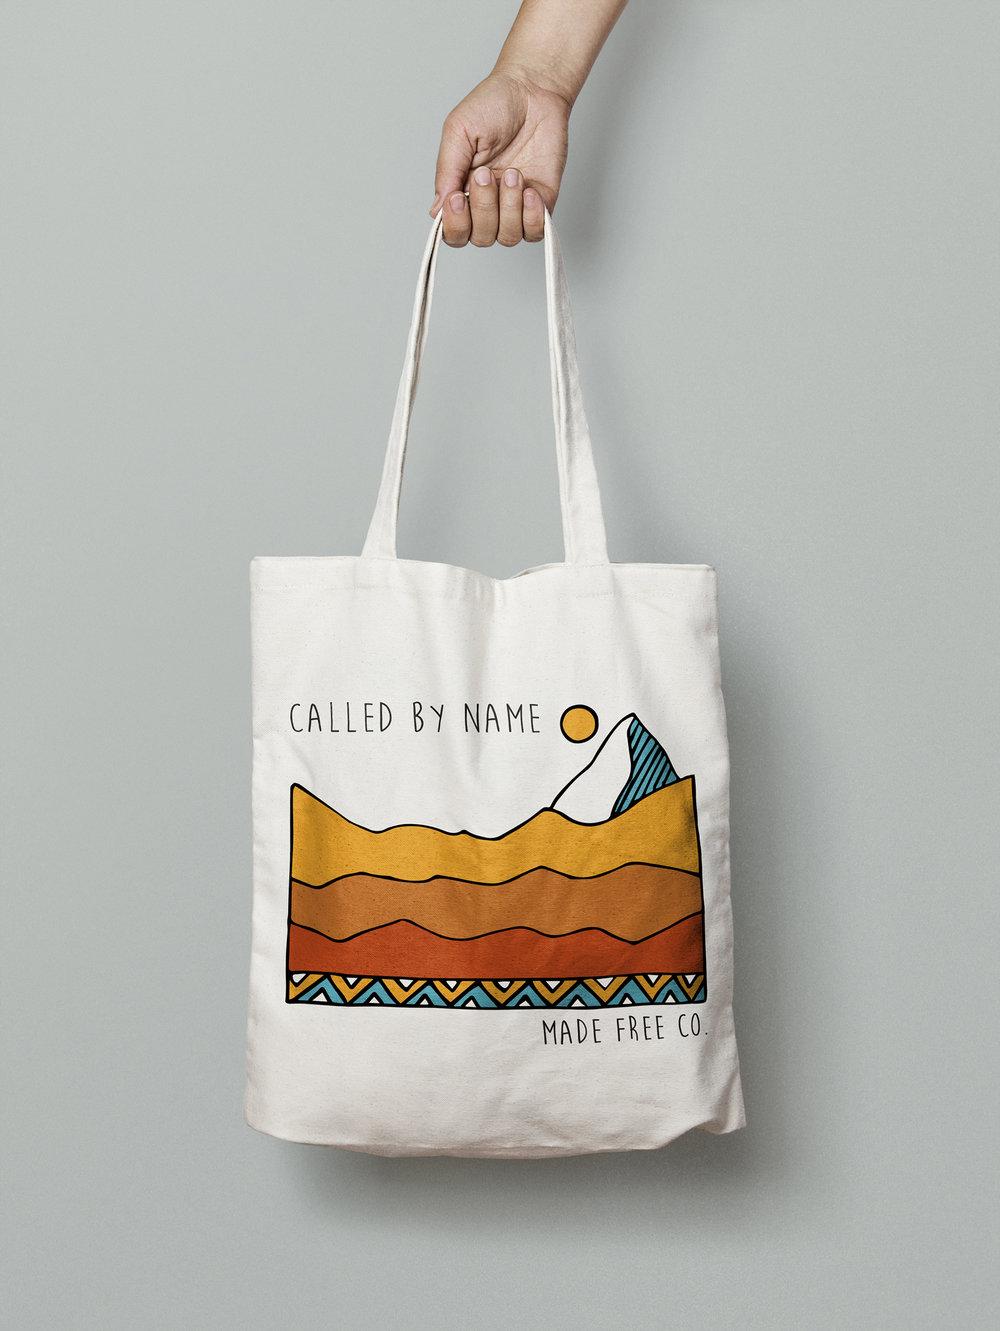 made free desert tote bag mockup.jpg